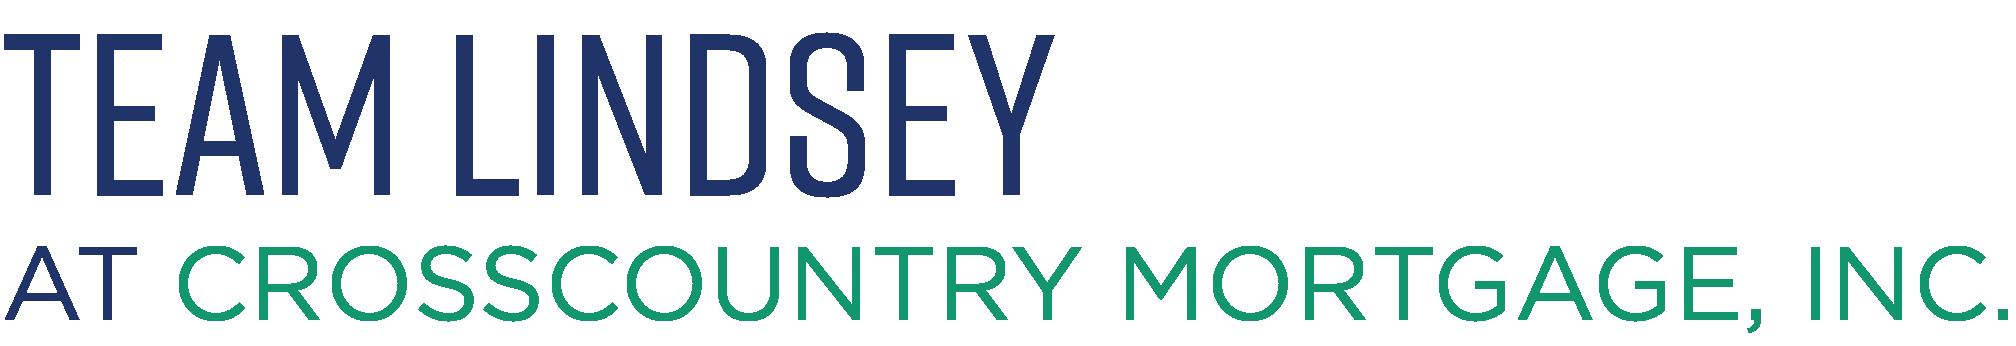 Eagle Sponsor (Title Sponsor) - Team Lindsey - Cross Country Mortgage - Logo